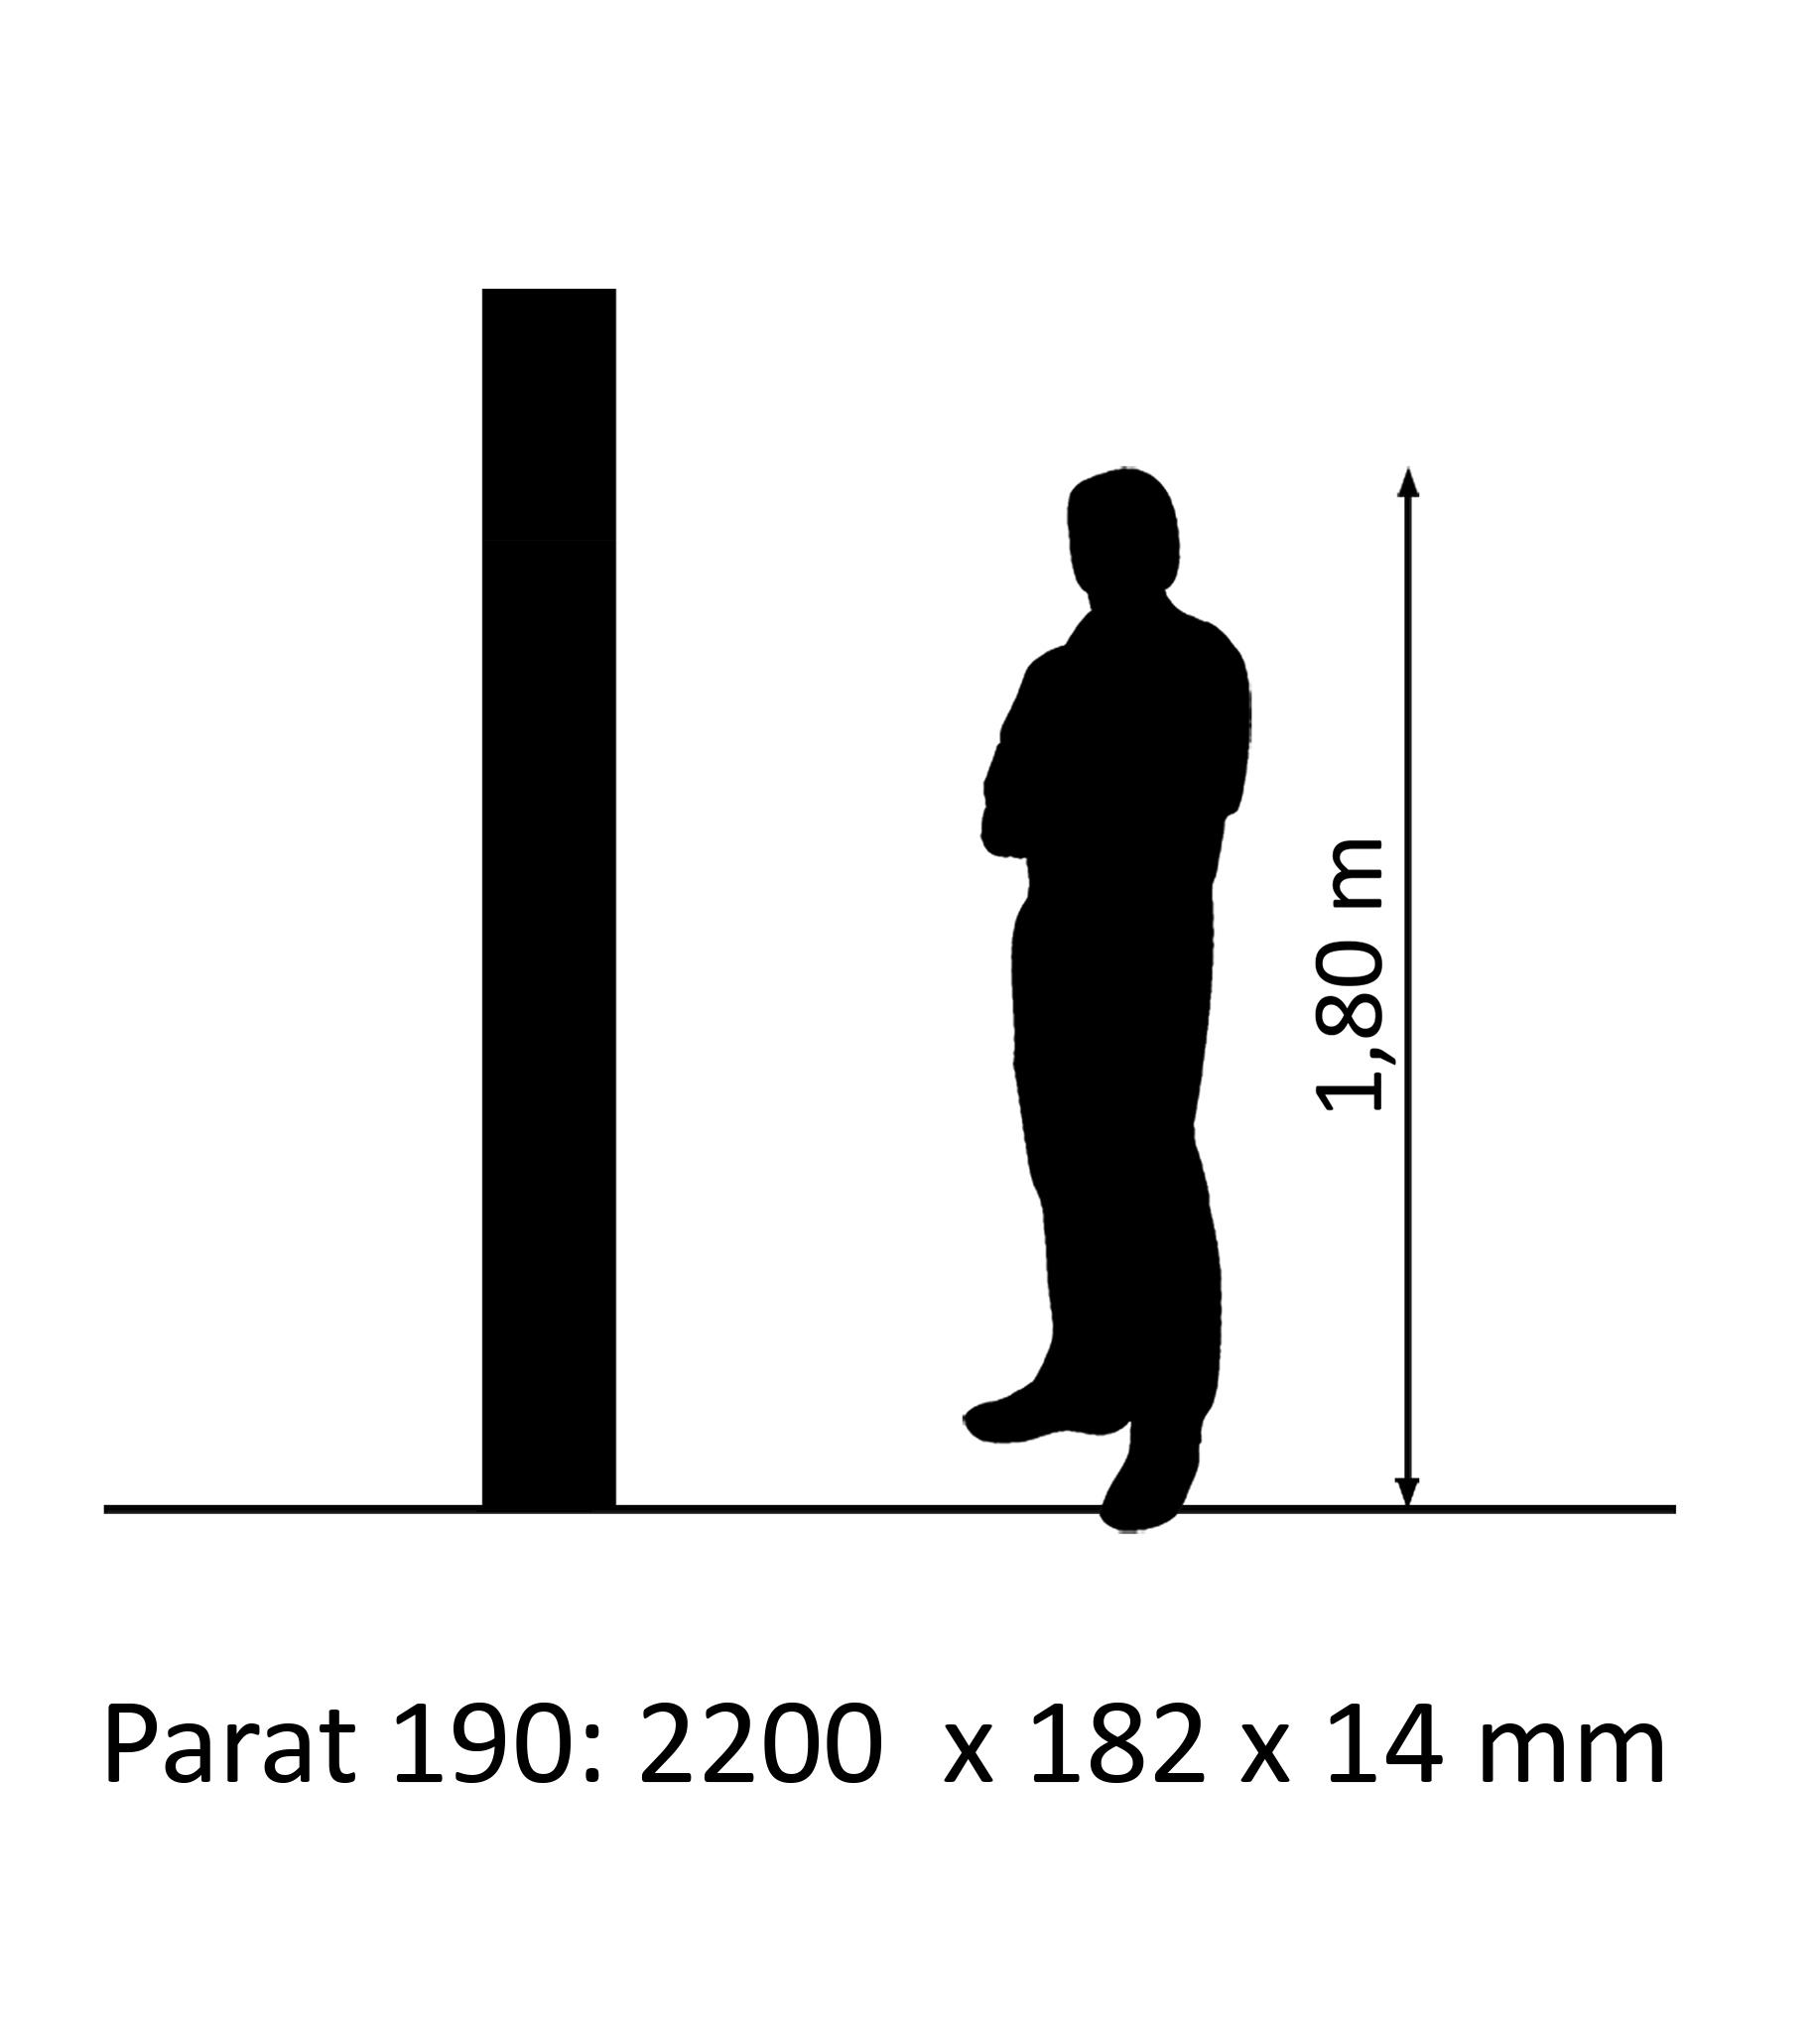 PARAT 190 can. Maple avant-garde 3-Strip